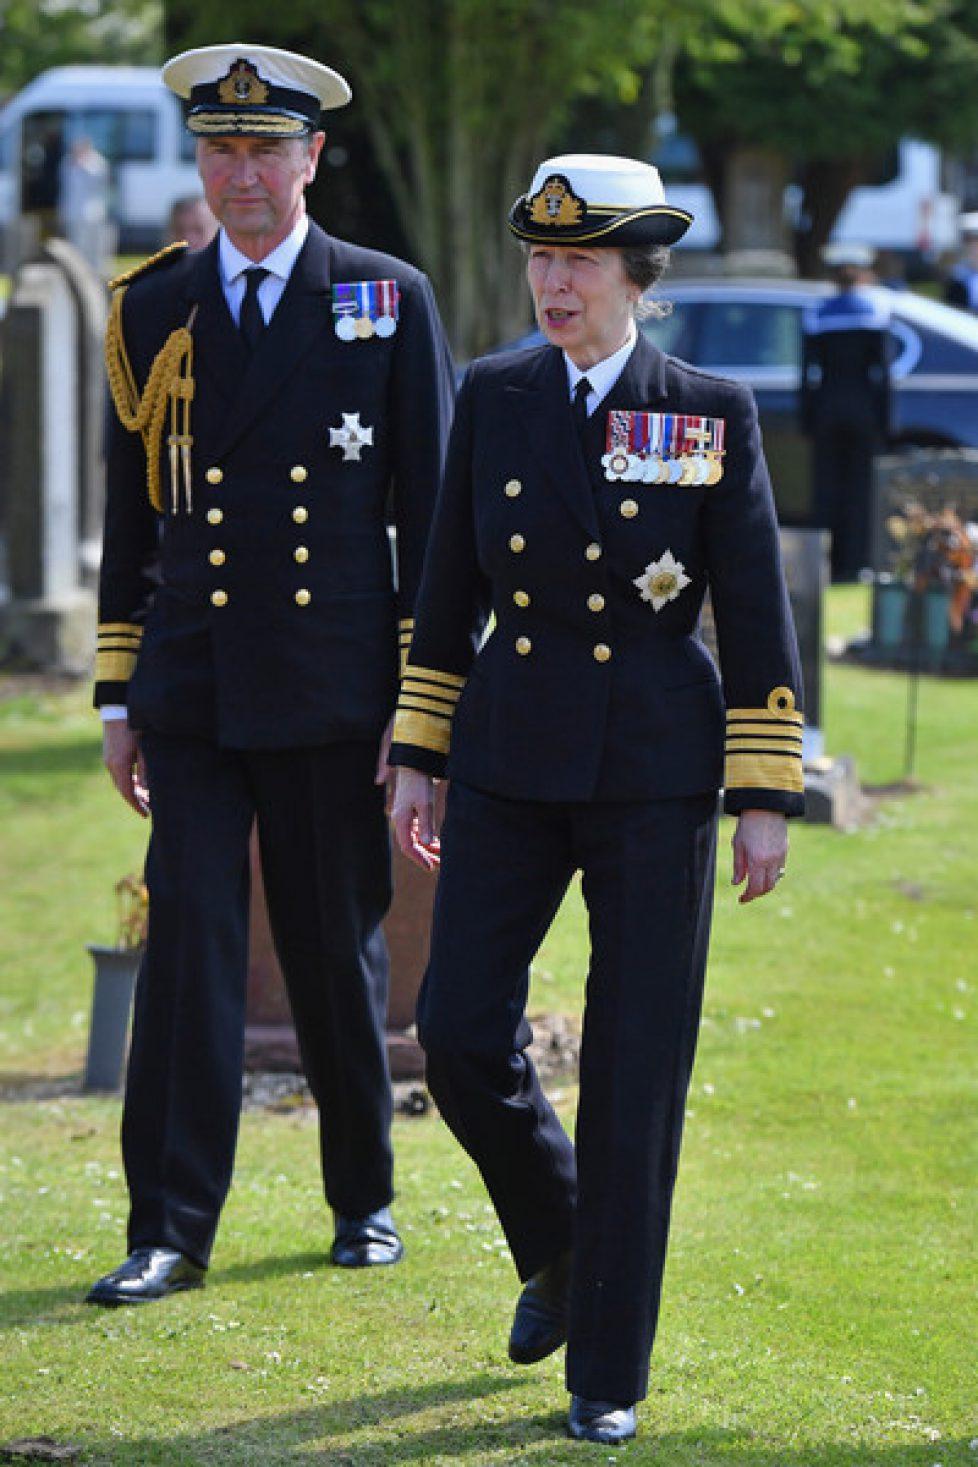 Princess+Anne+Leads+Battle+Jutland+Centenary+uihjkbZHUAvl